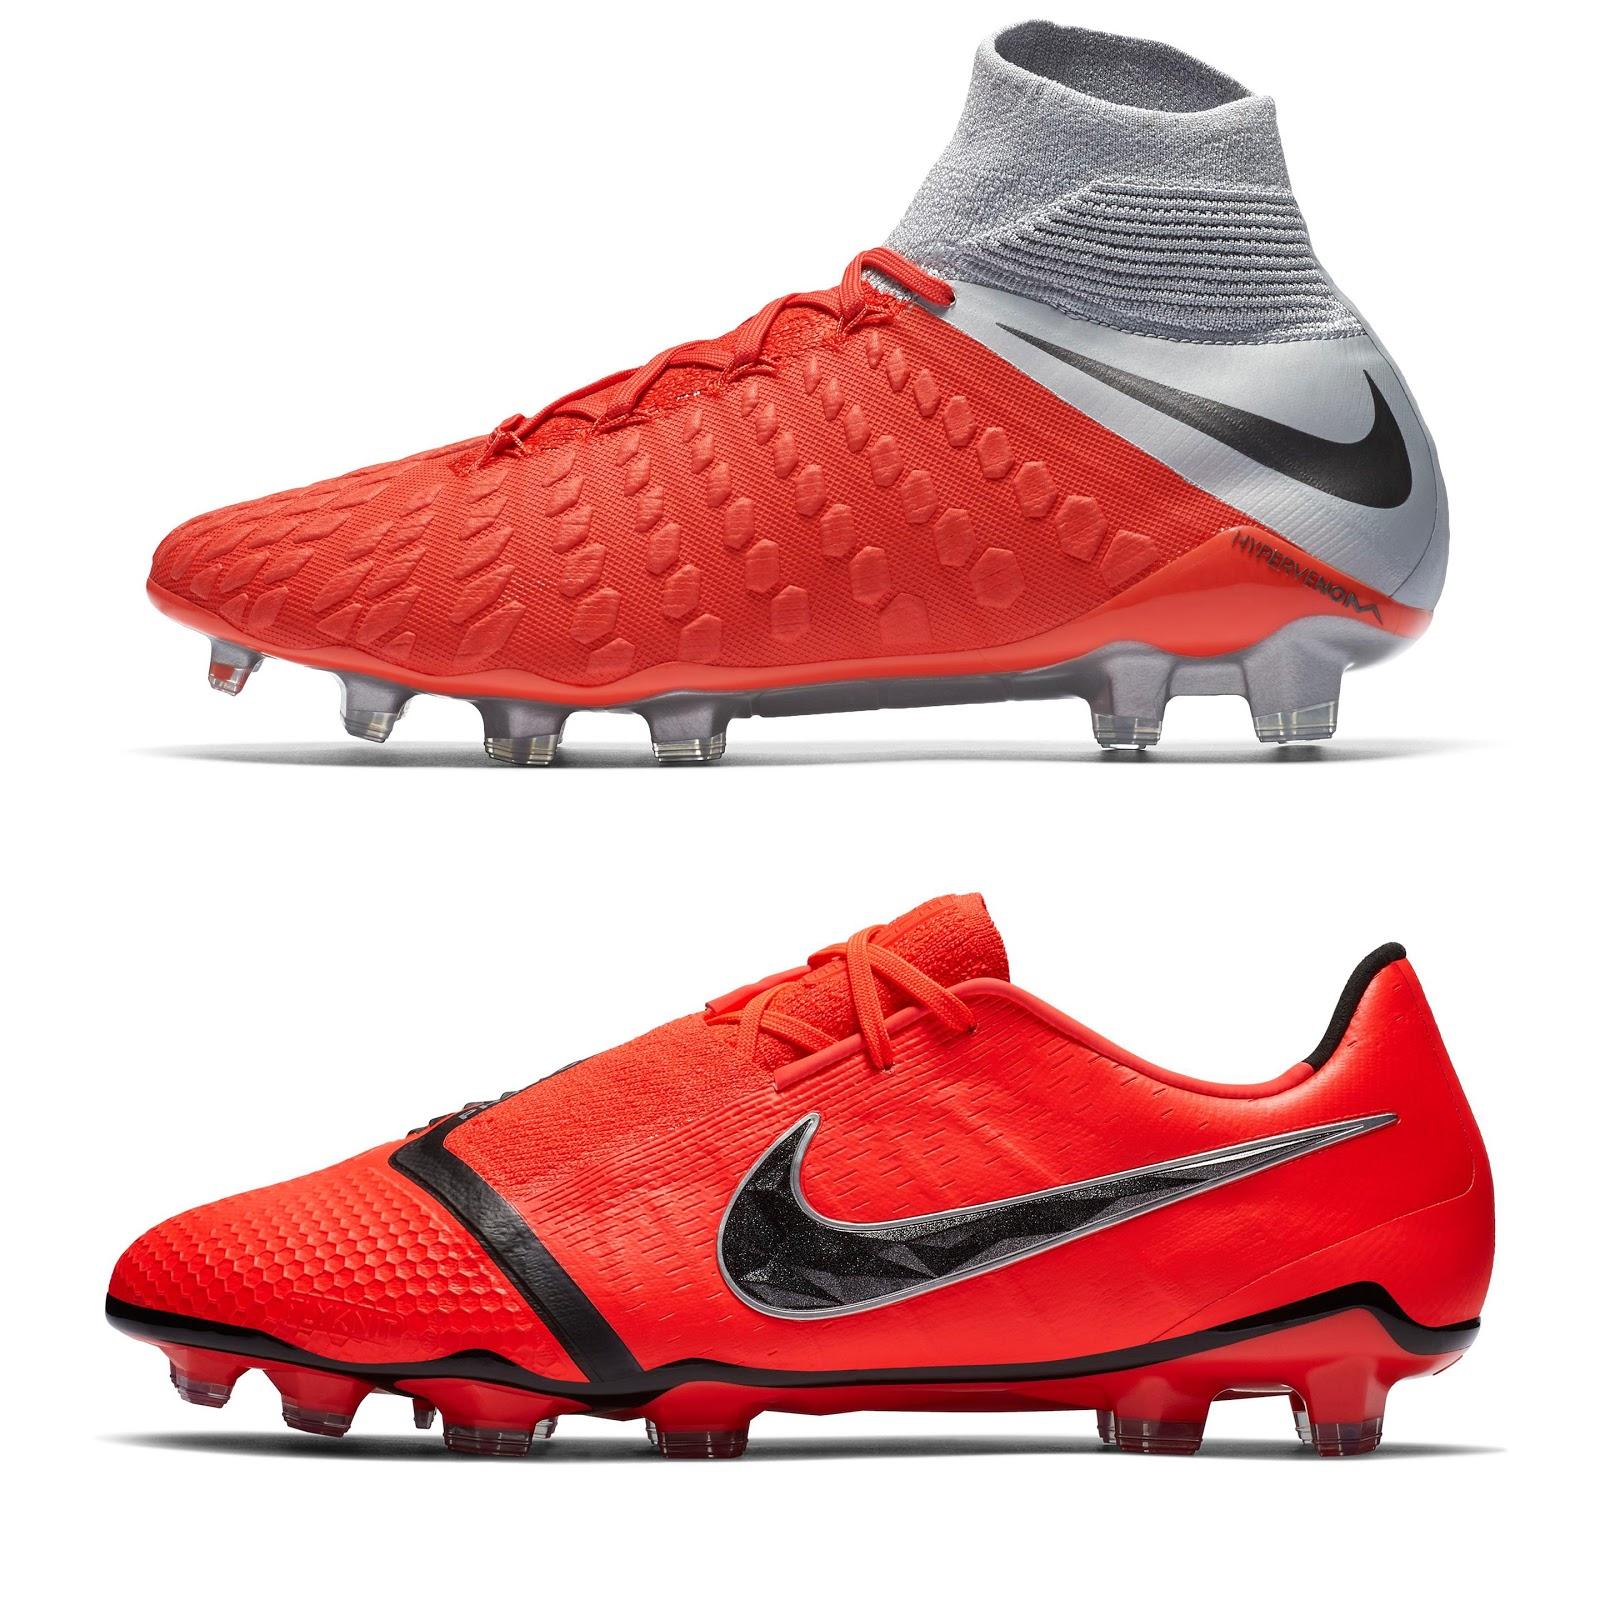 newest 94bc1 b1774 Discontinued Nike Hypervenom vs All-New Nike Phantom ...